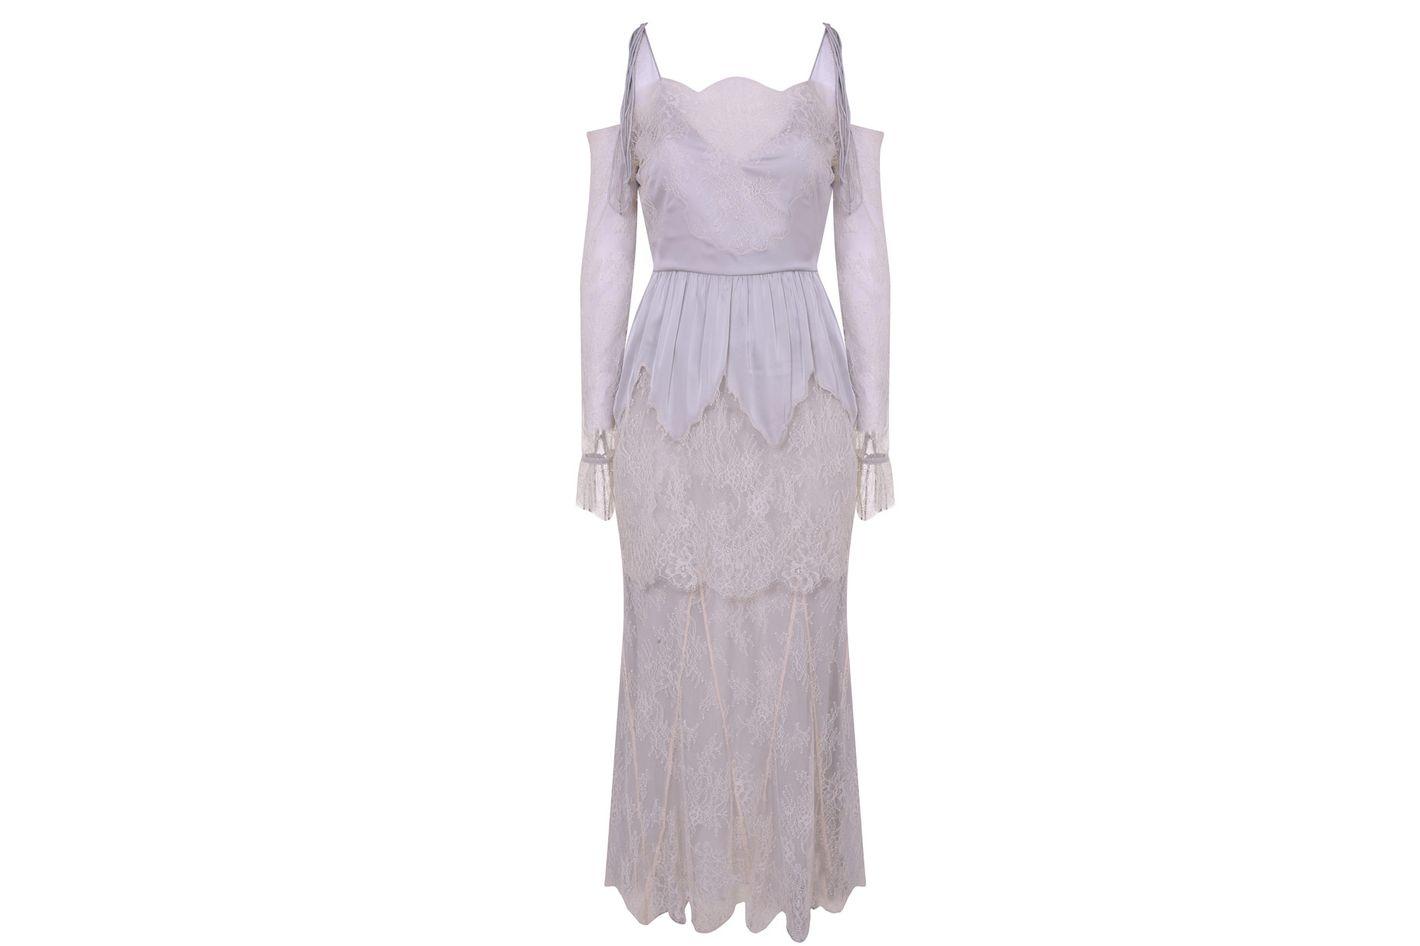 Cutwork Lace Bardot Bridal Dress